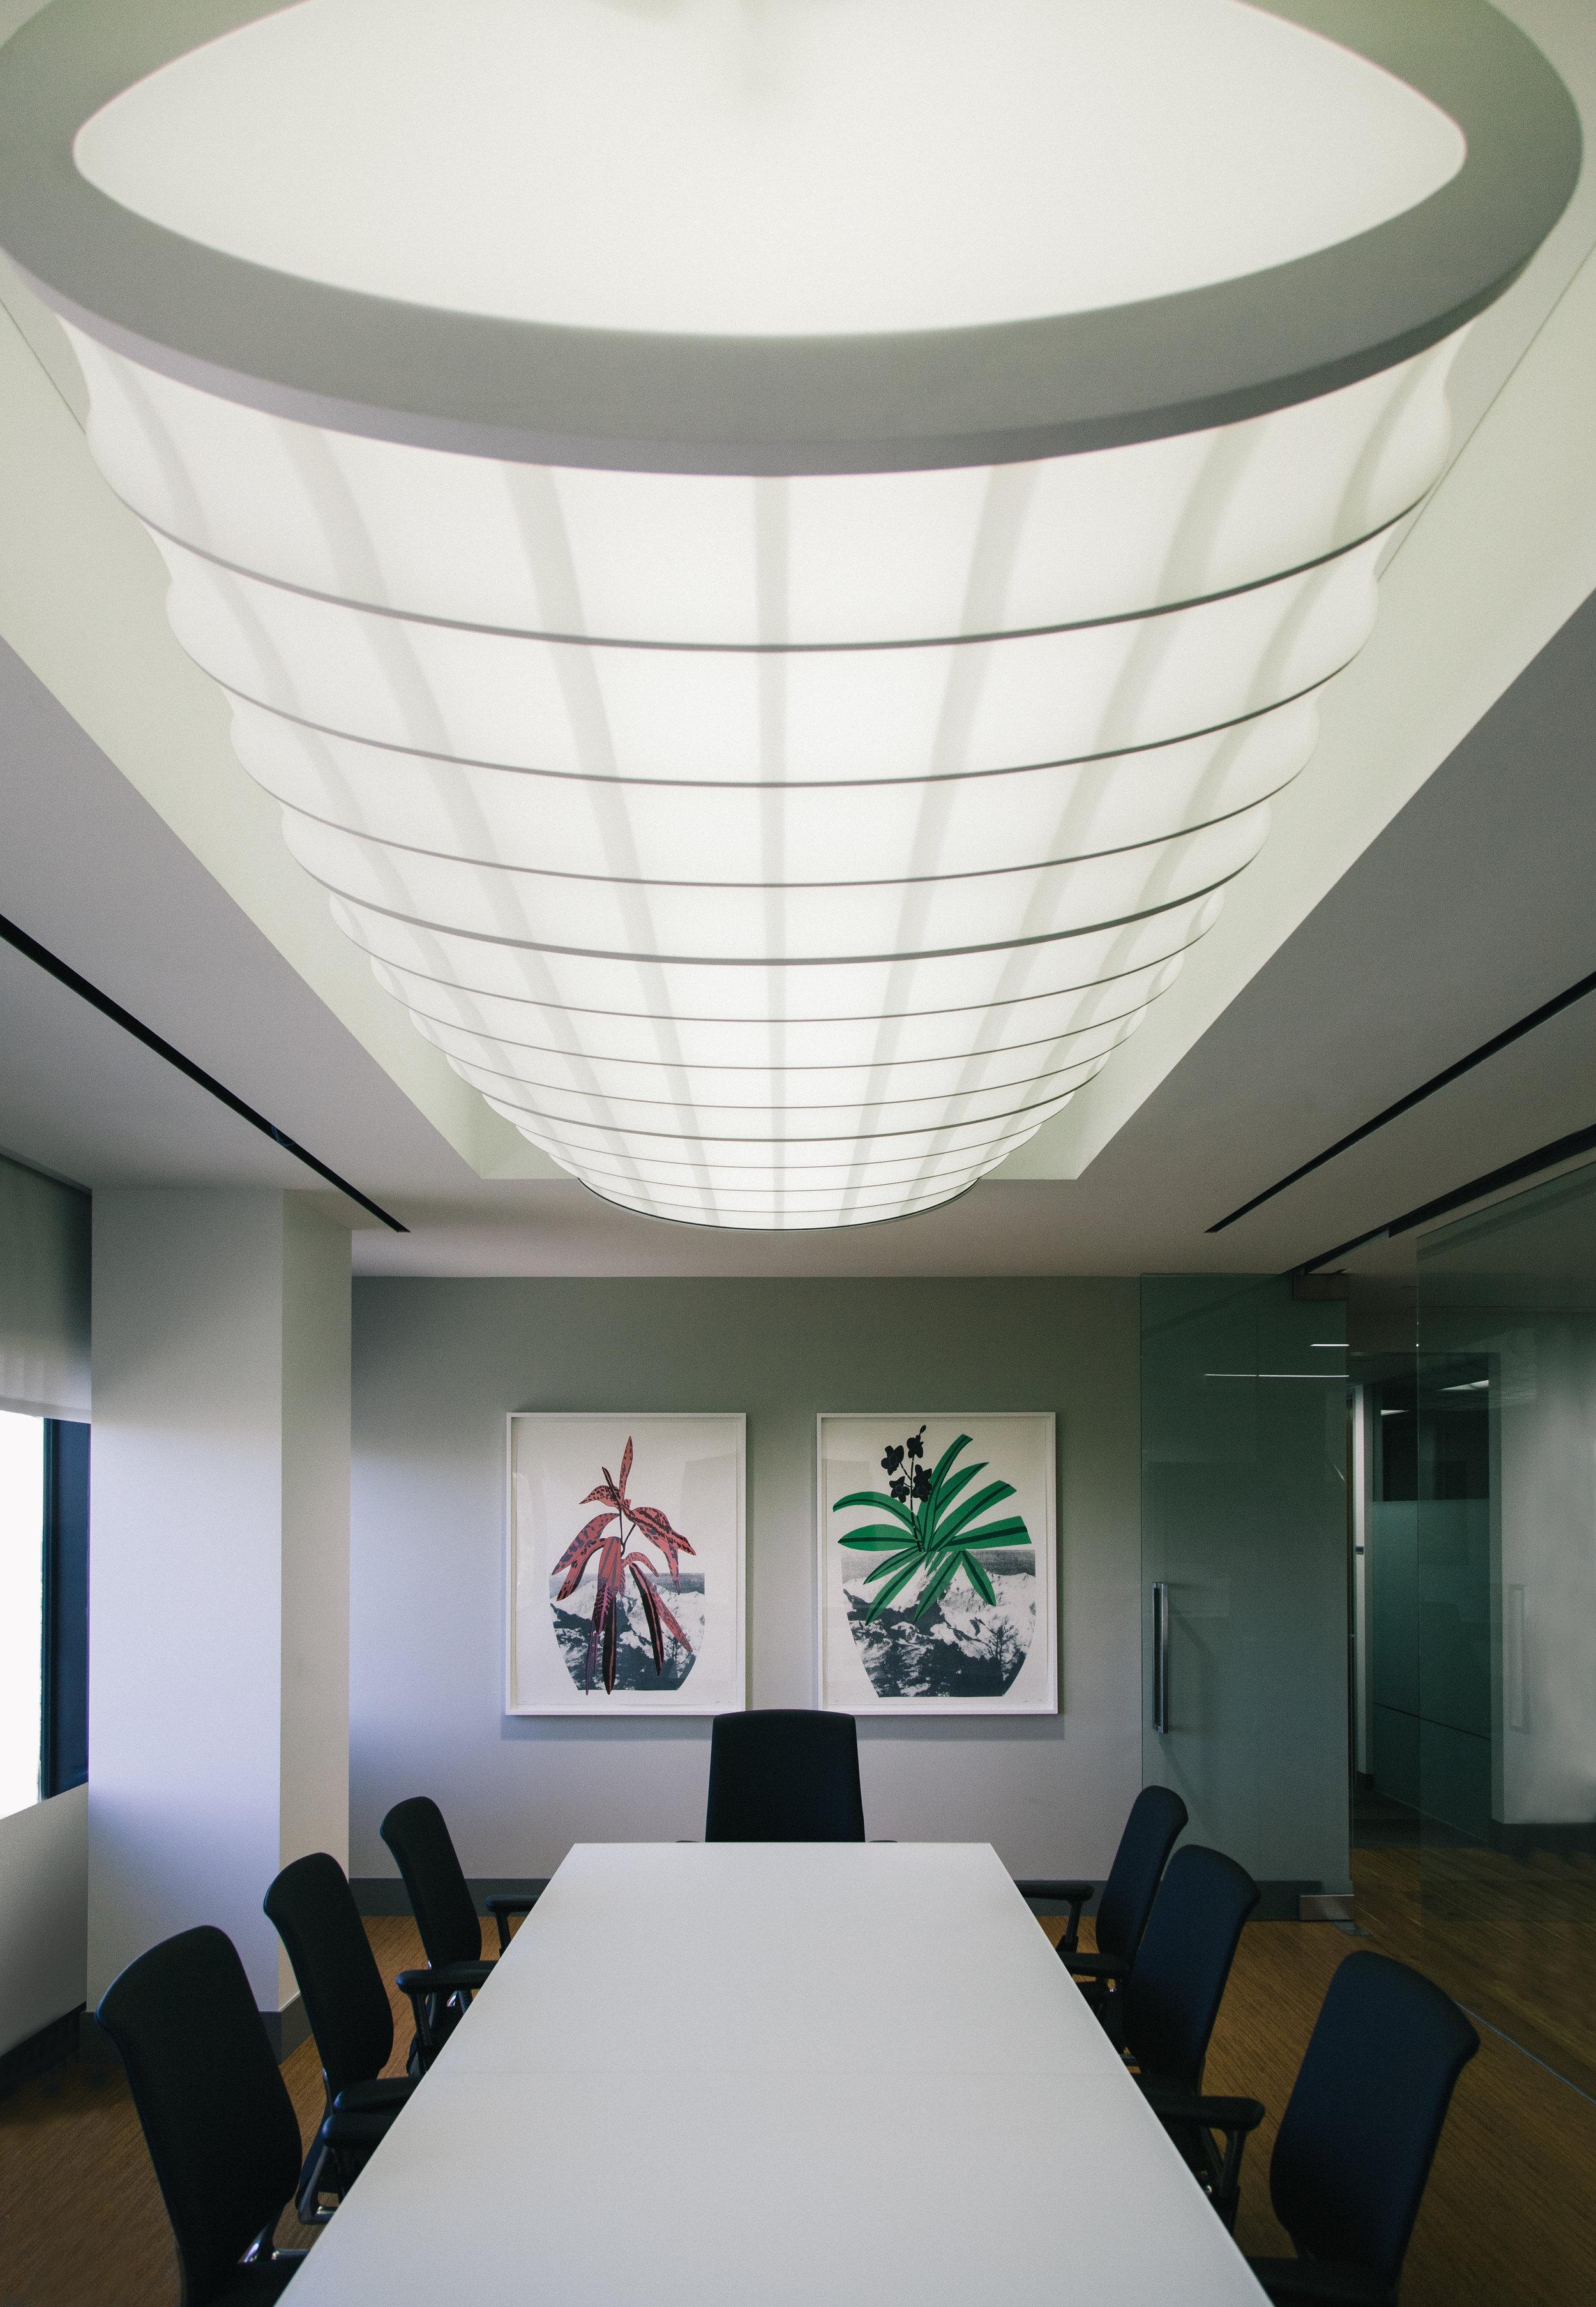 S.E.A.-Studio-Environmental-Architecture-David-Hertz-FAIA-First-Pacific-Advisors-Los-Angeles-tenant-improvement-sustainable-regenerative-restorative-green-design-office-sleek-modern-interior-Westside-commercial-building-professional-workplace-12.jpg